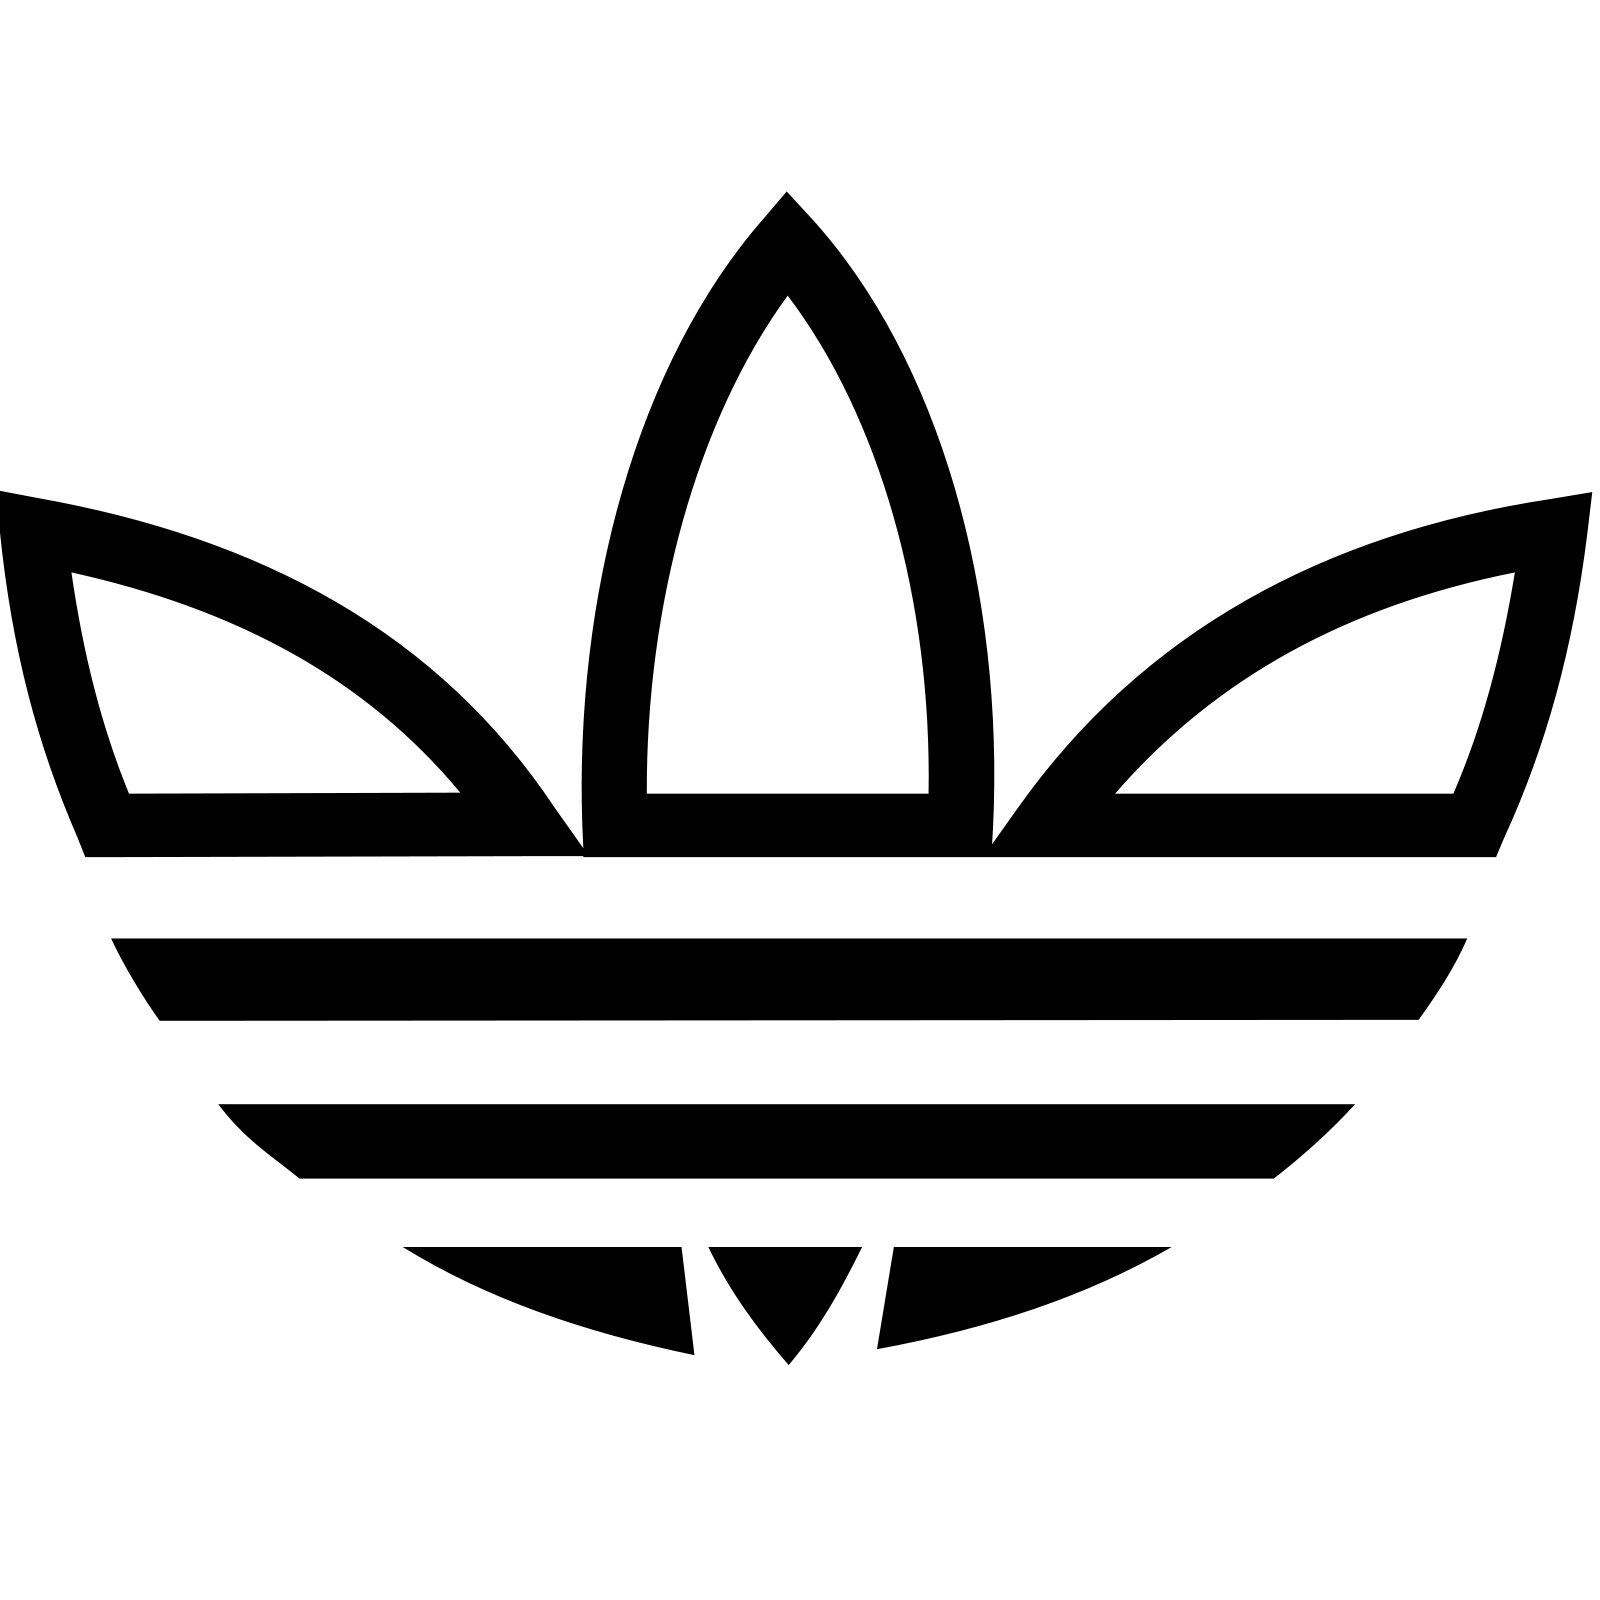 Adidas Trefoil PNG Transparent Adidas Trefoil.PNG Images ...